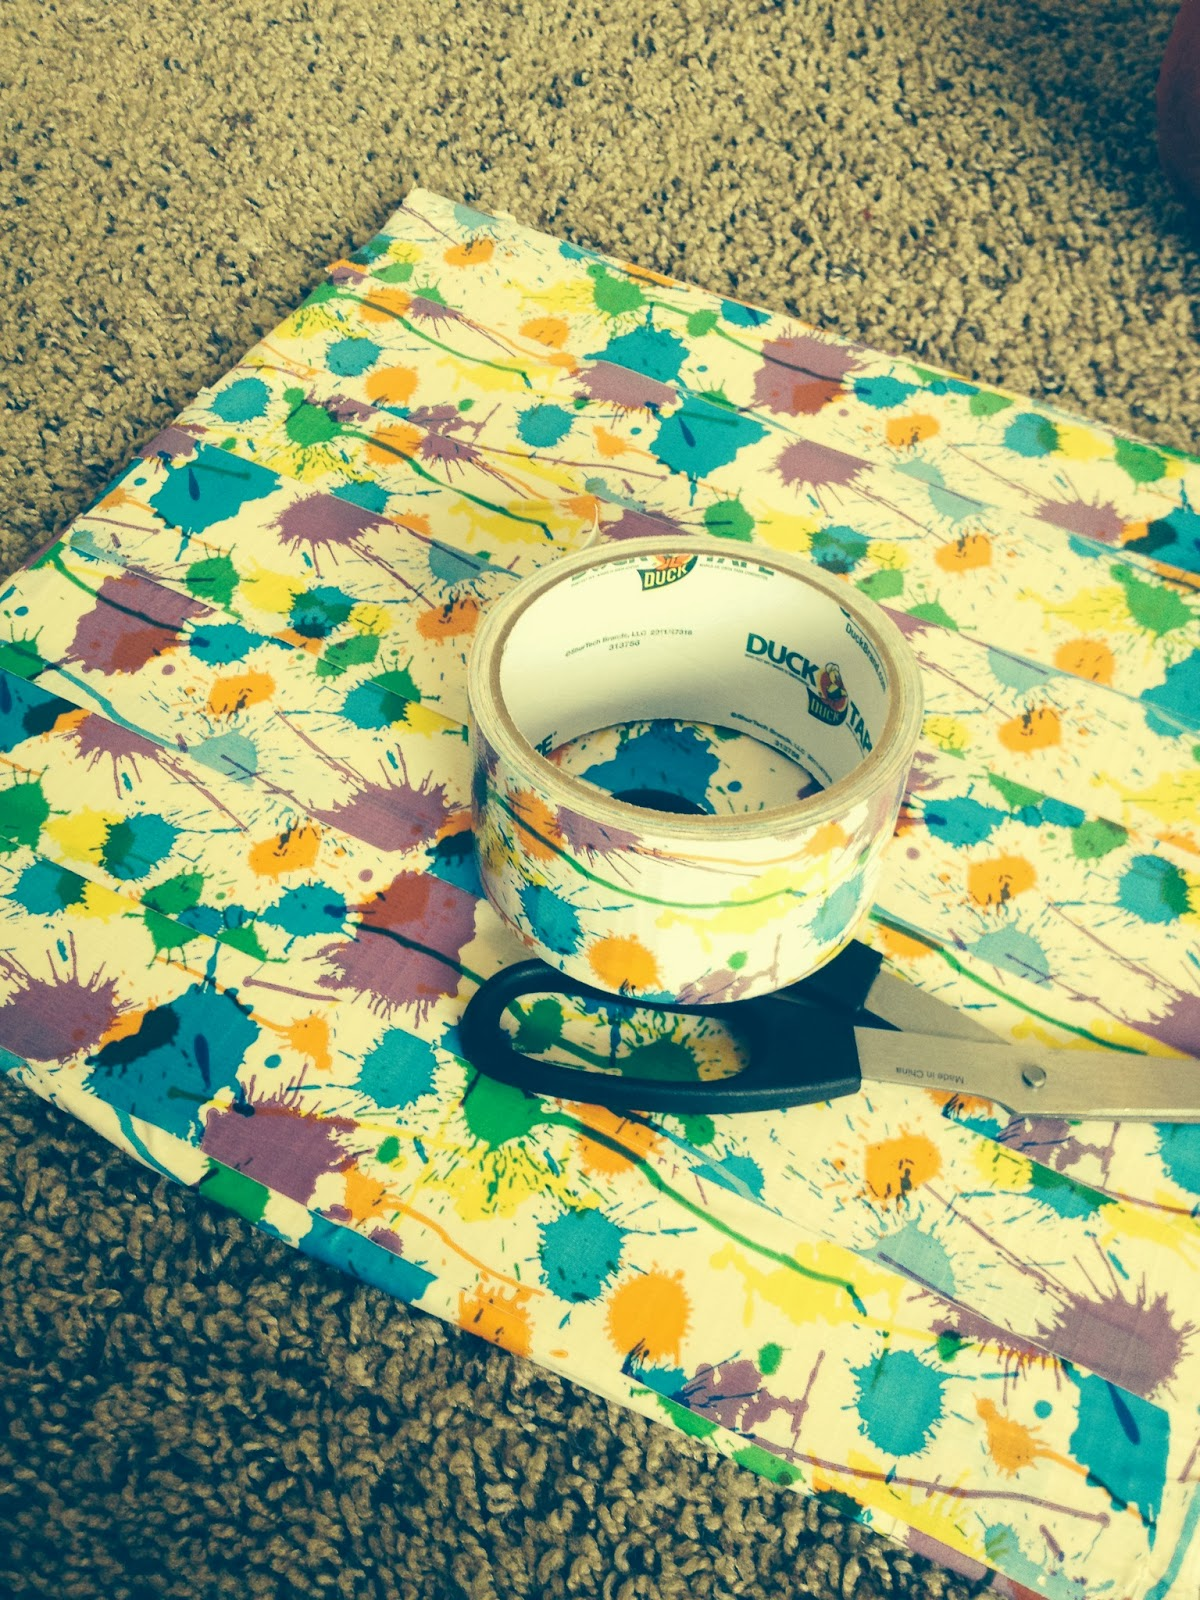 Squishy Zucchini : Zucchini Summer: Squishy Board (DIY)